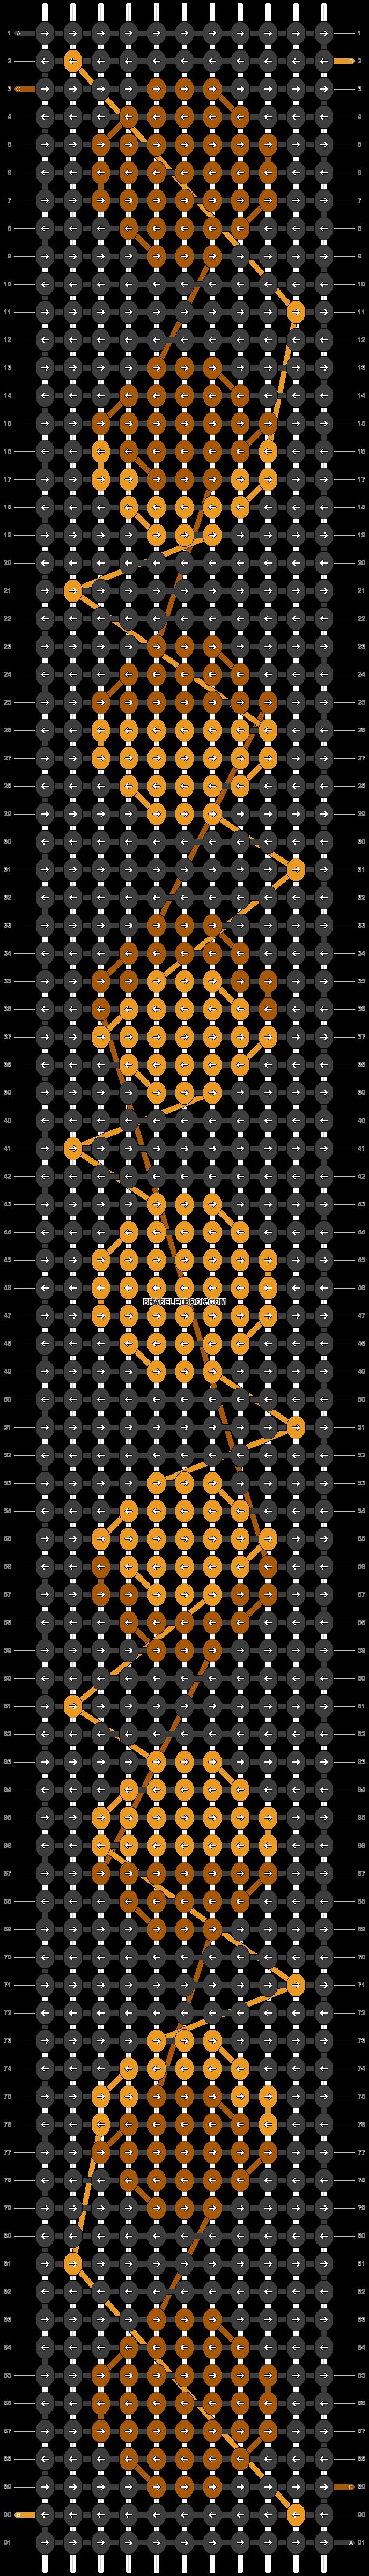 Alpha pattern #26521 variation #8796 pattern